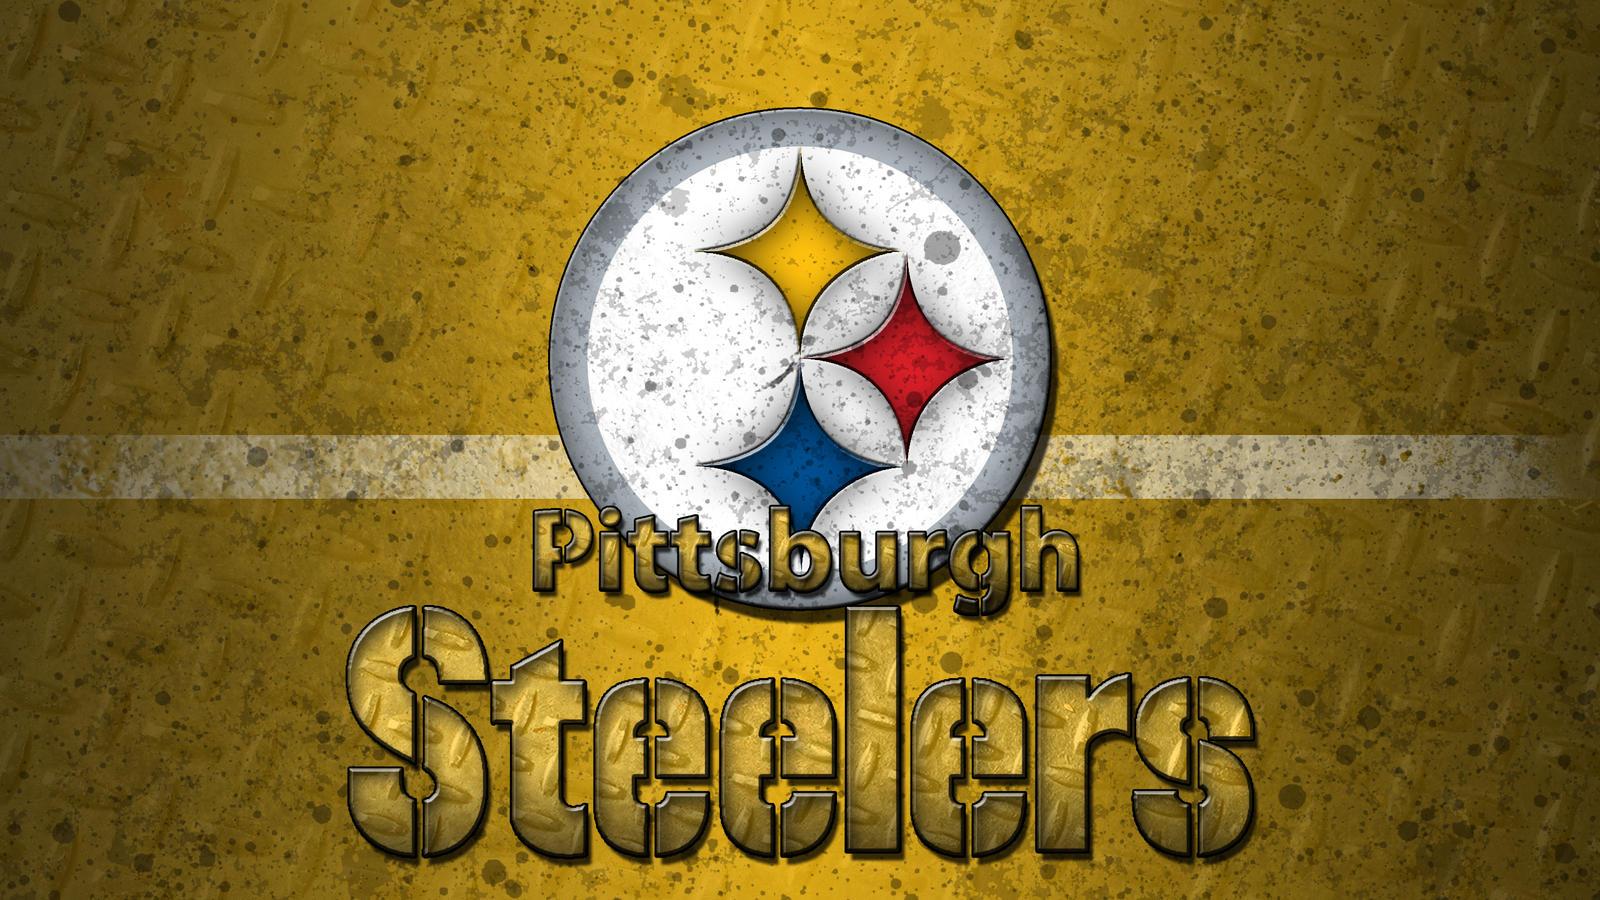 Pittsburgh Steelers Wall Art - Elitflat